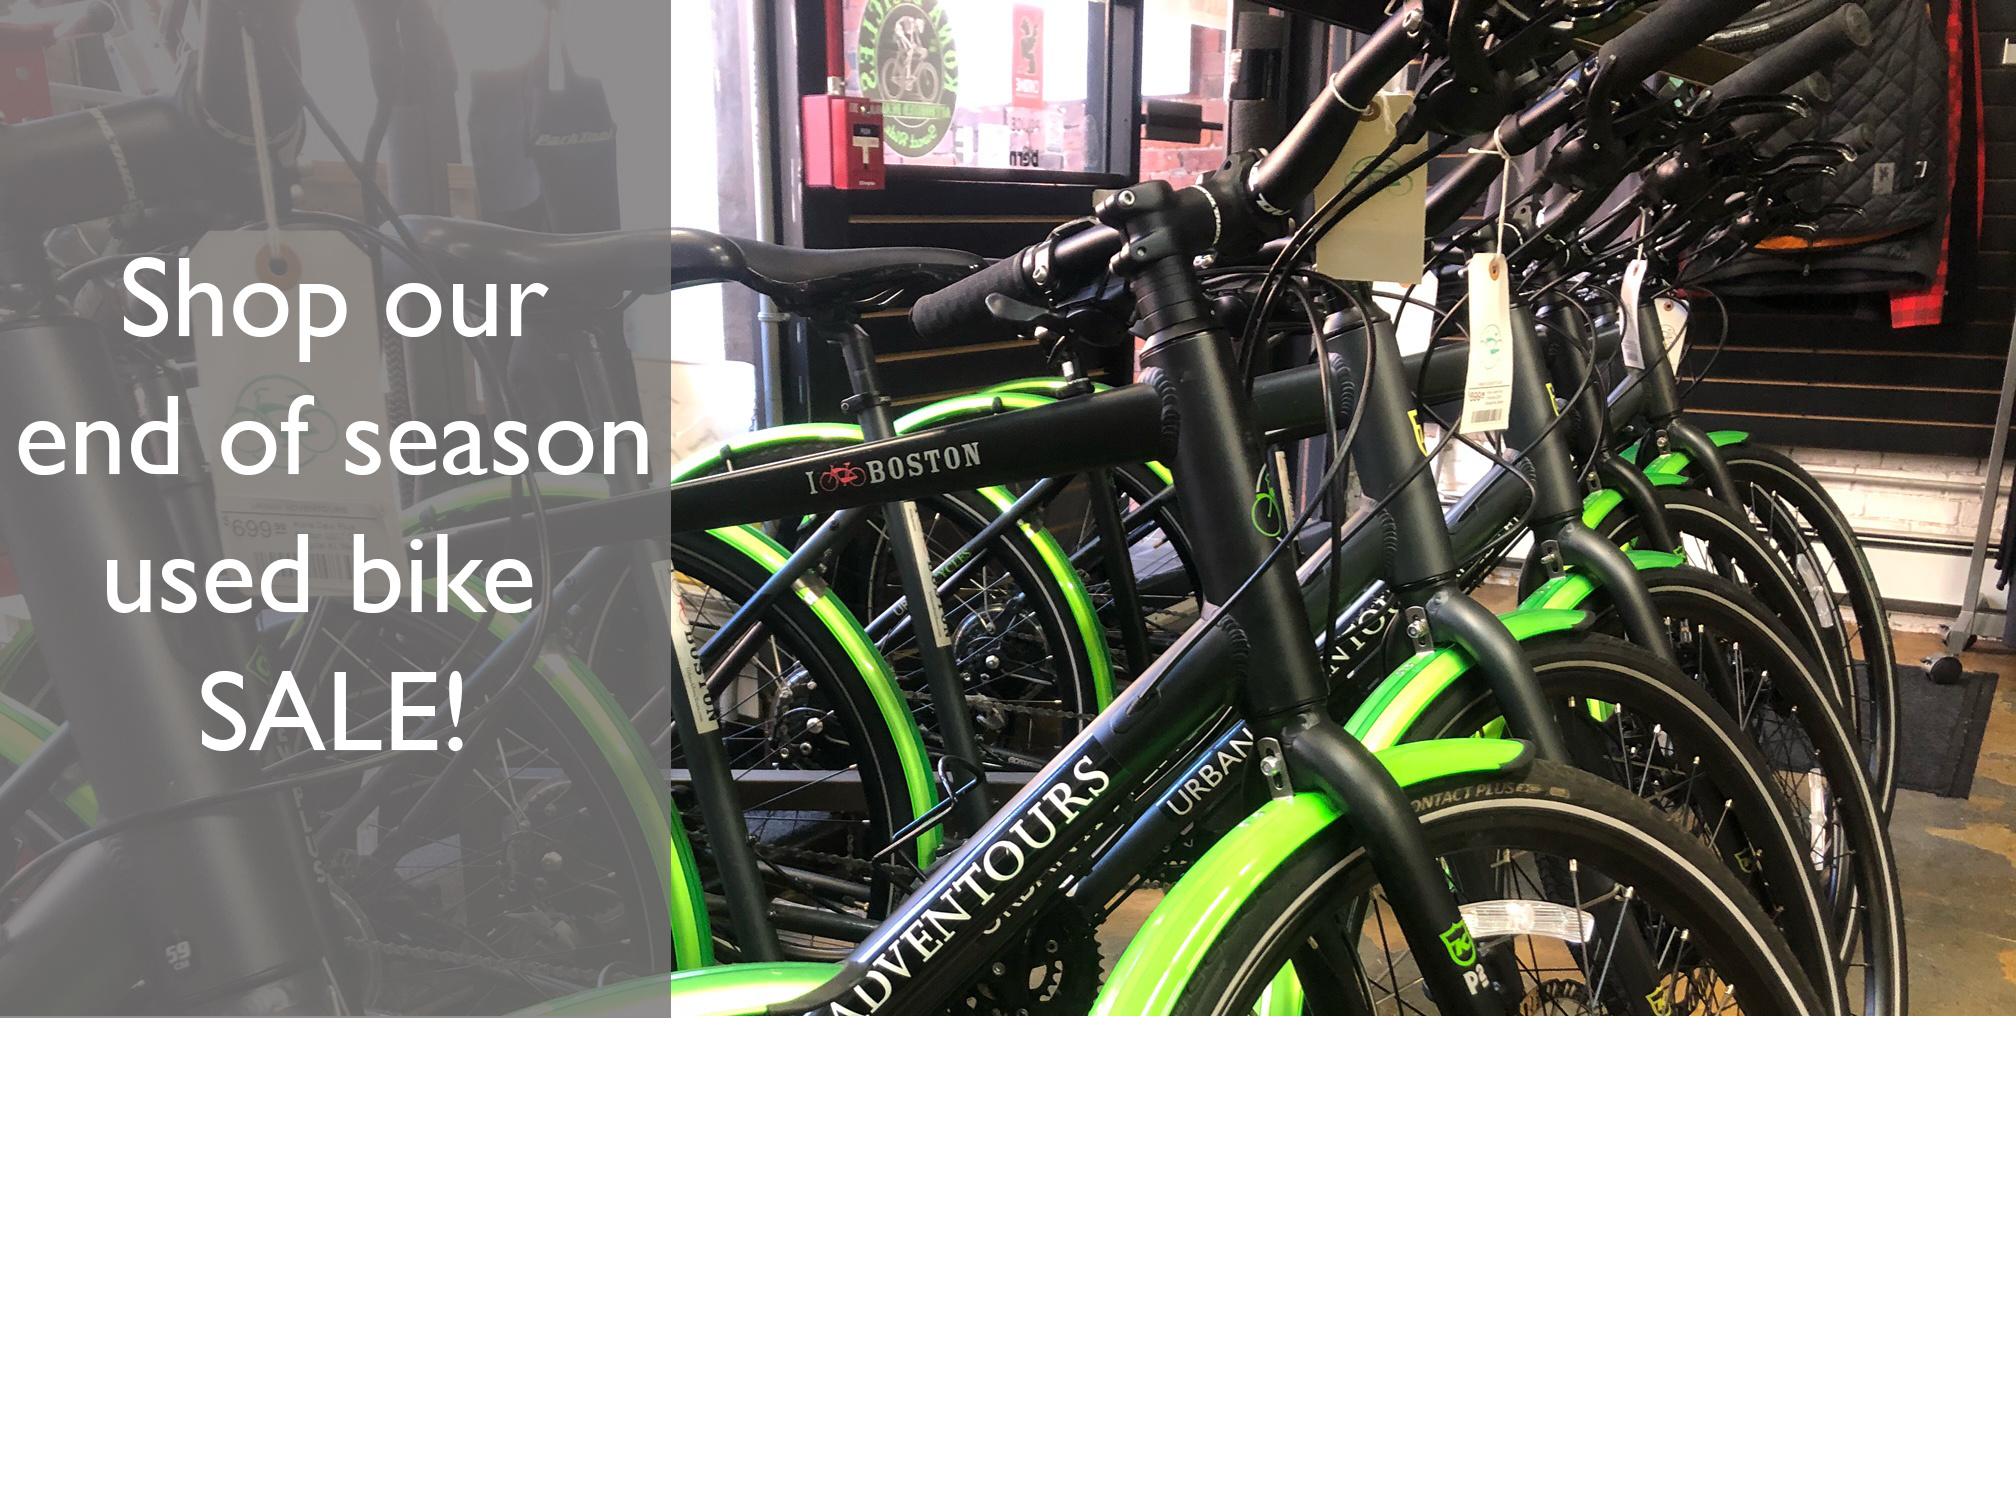 Used Bike Sale